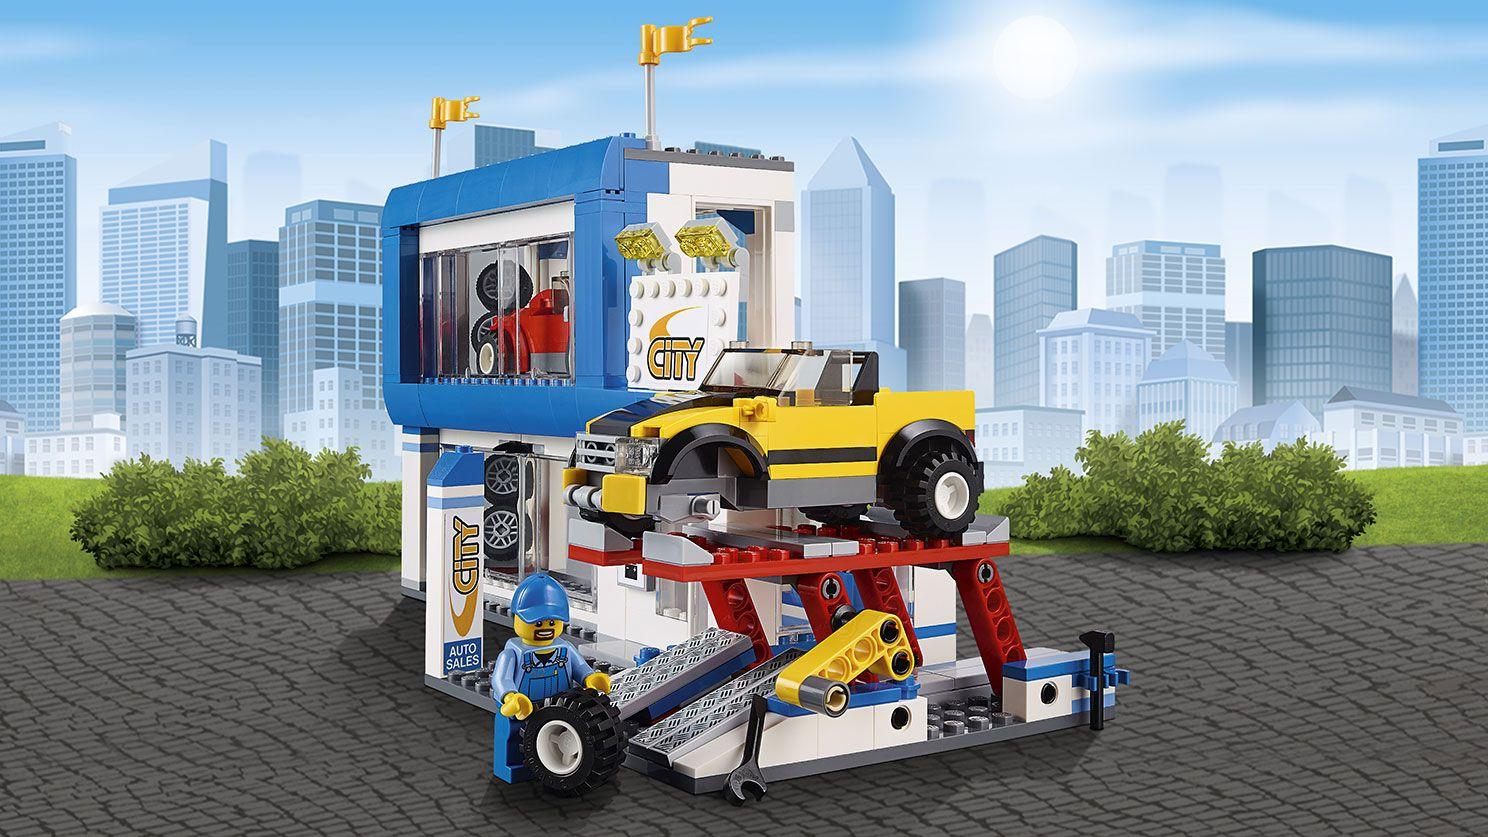 Lego City Garage : Lego city town garage and workshop city square lego